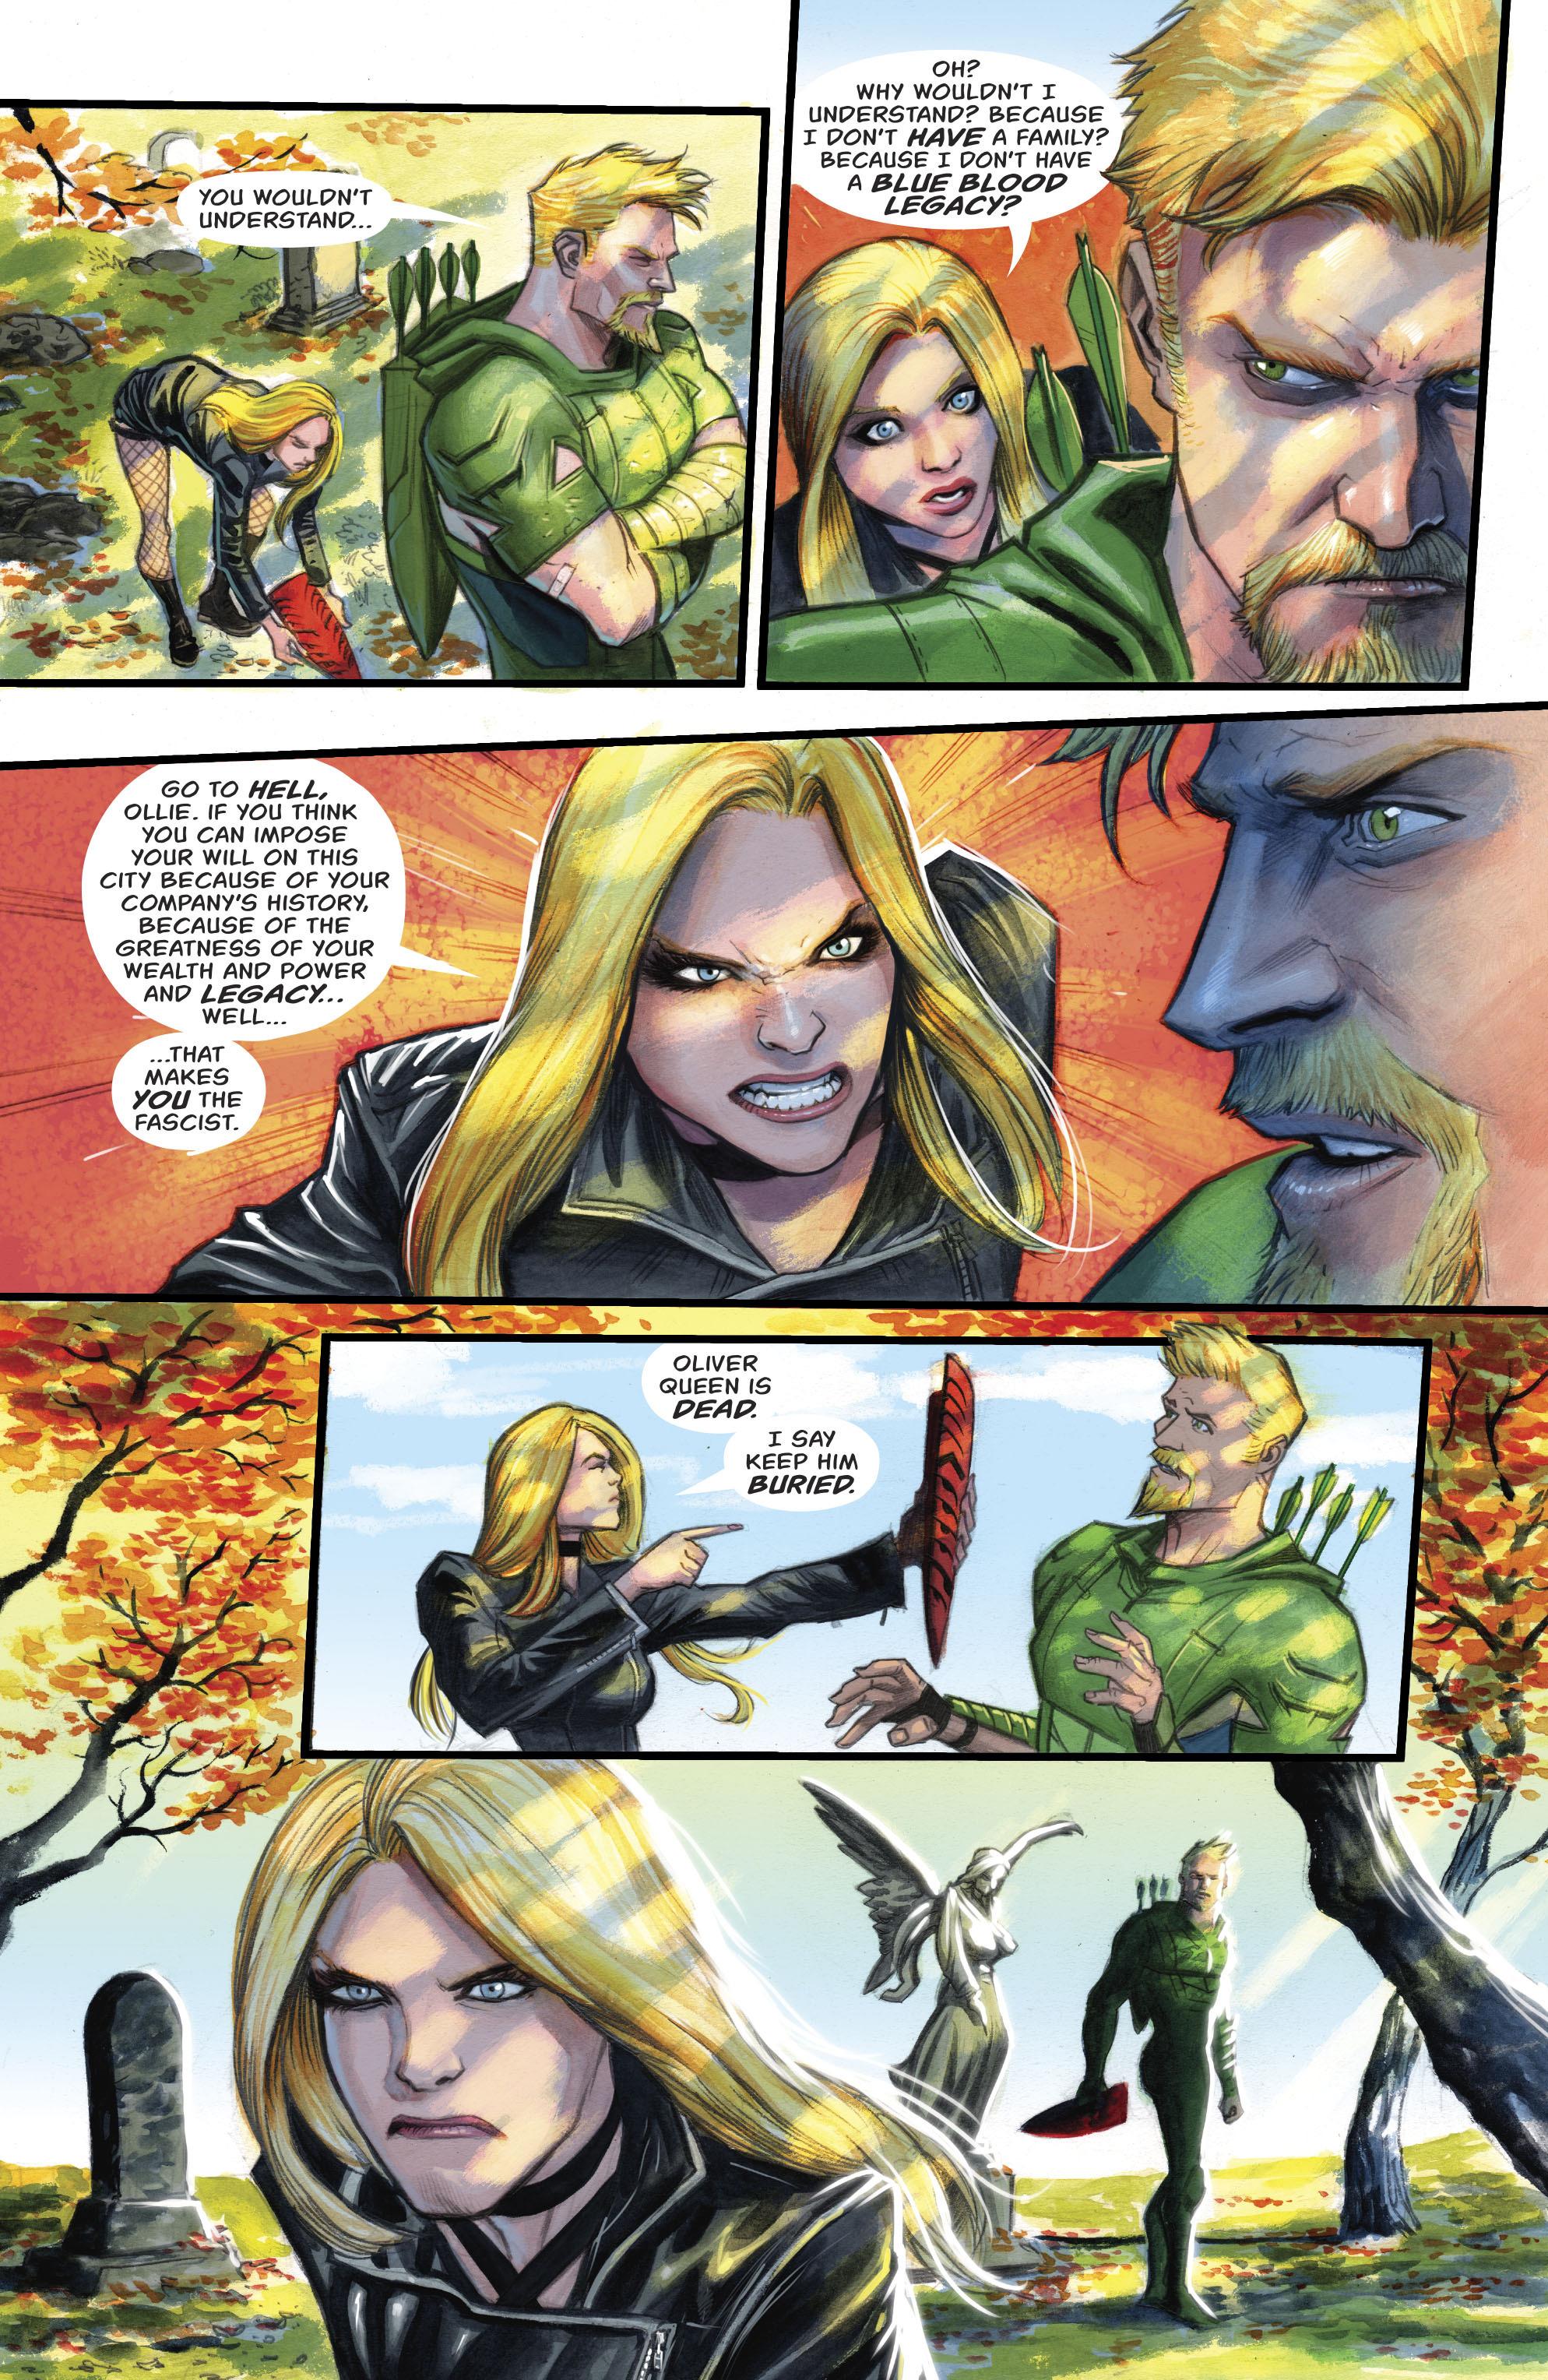 Read online Green Arrow (2016) comic -  Issue #22 - 21